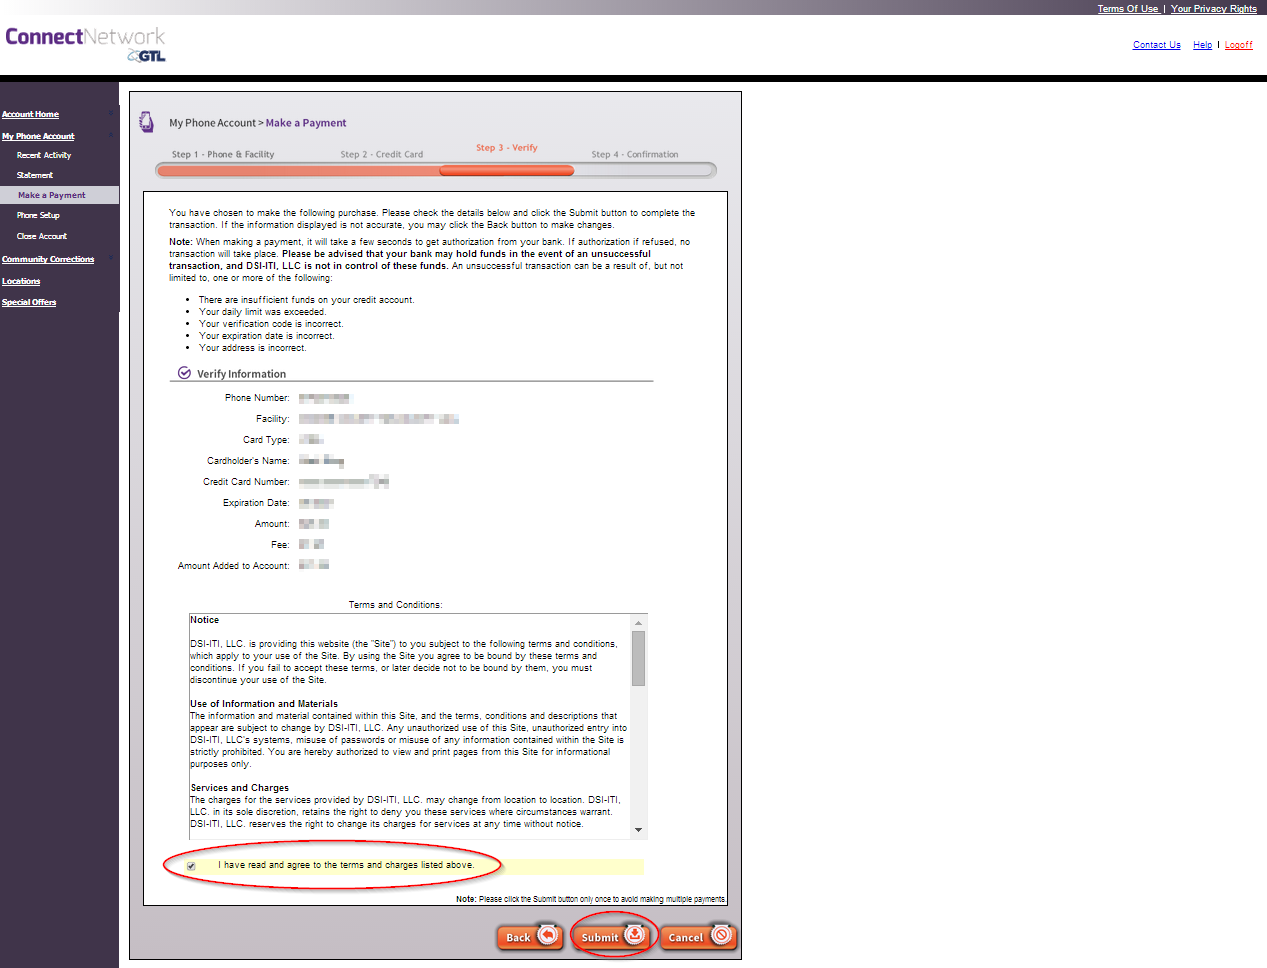 ConnectNetwork com Account Management Instructions - AdvancePay | GTL